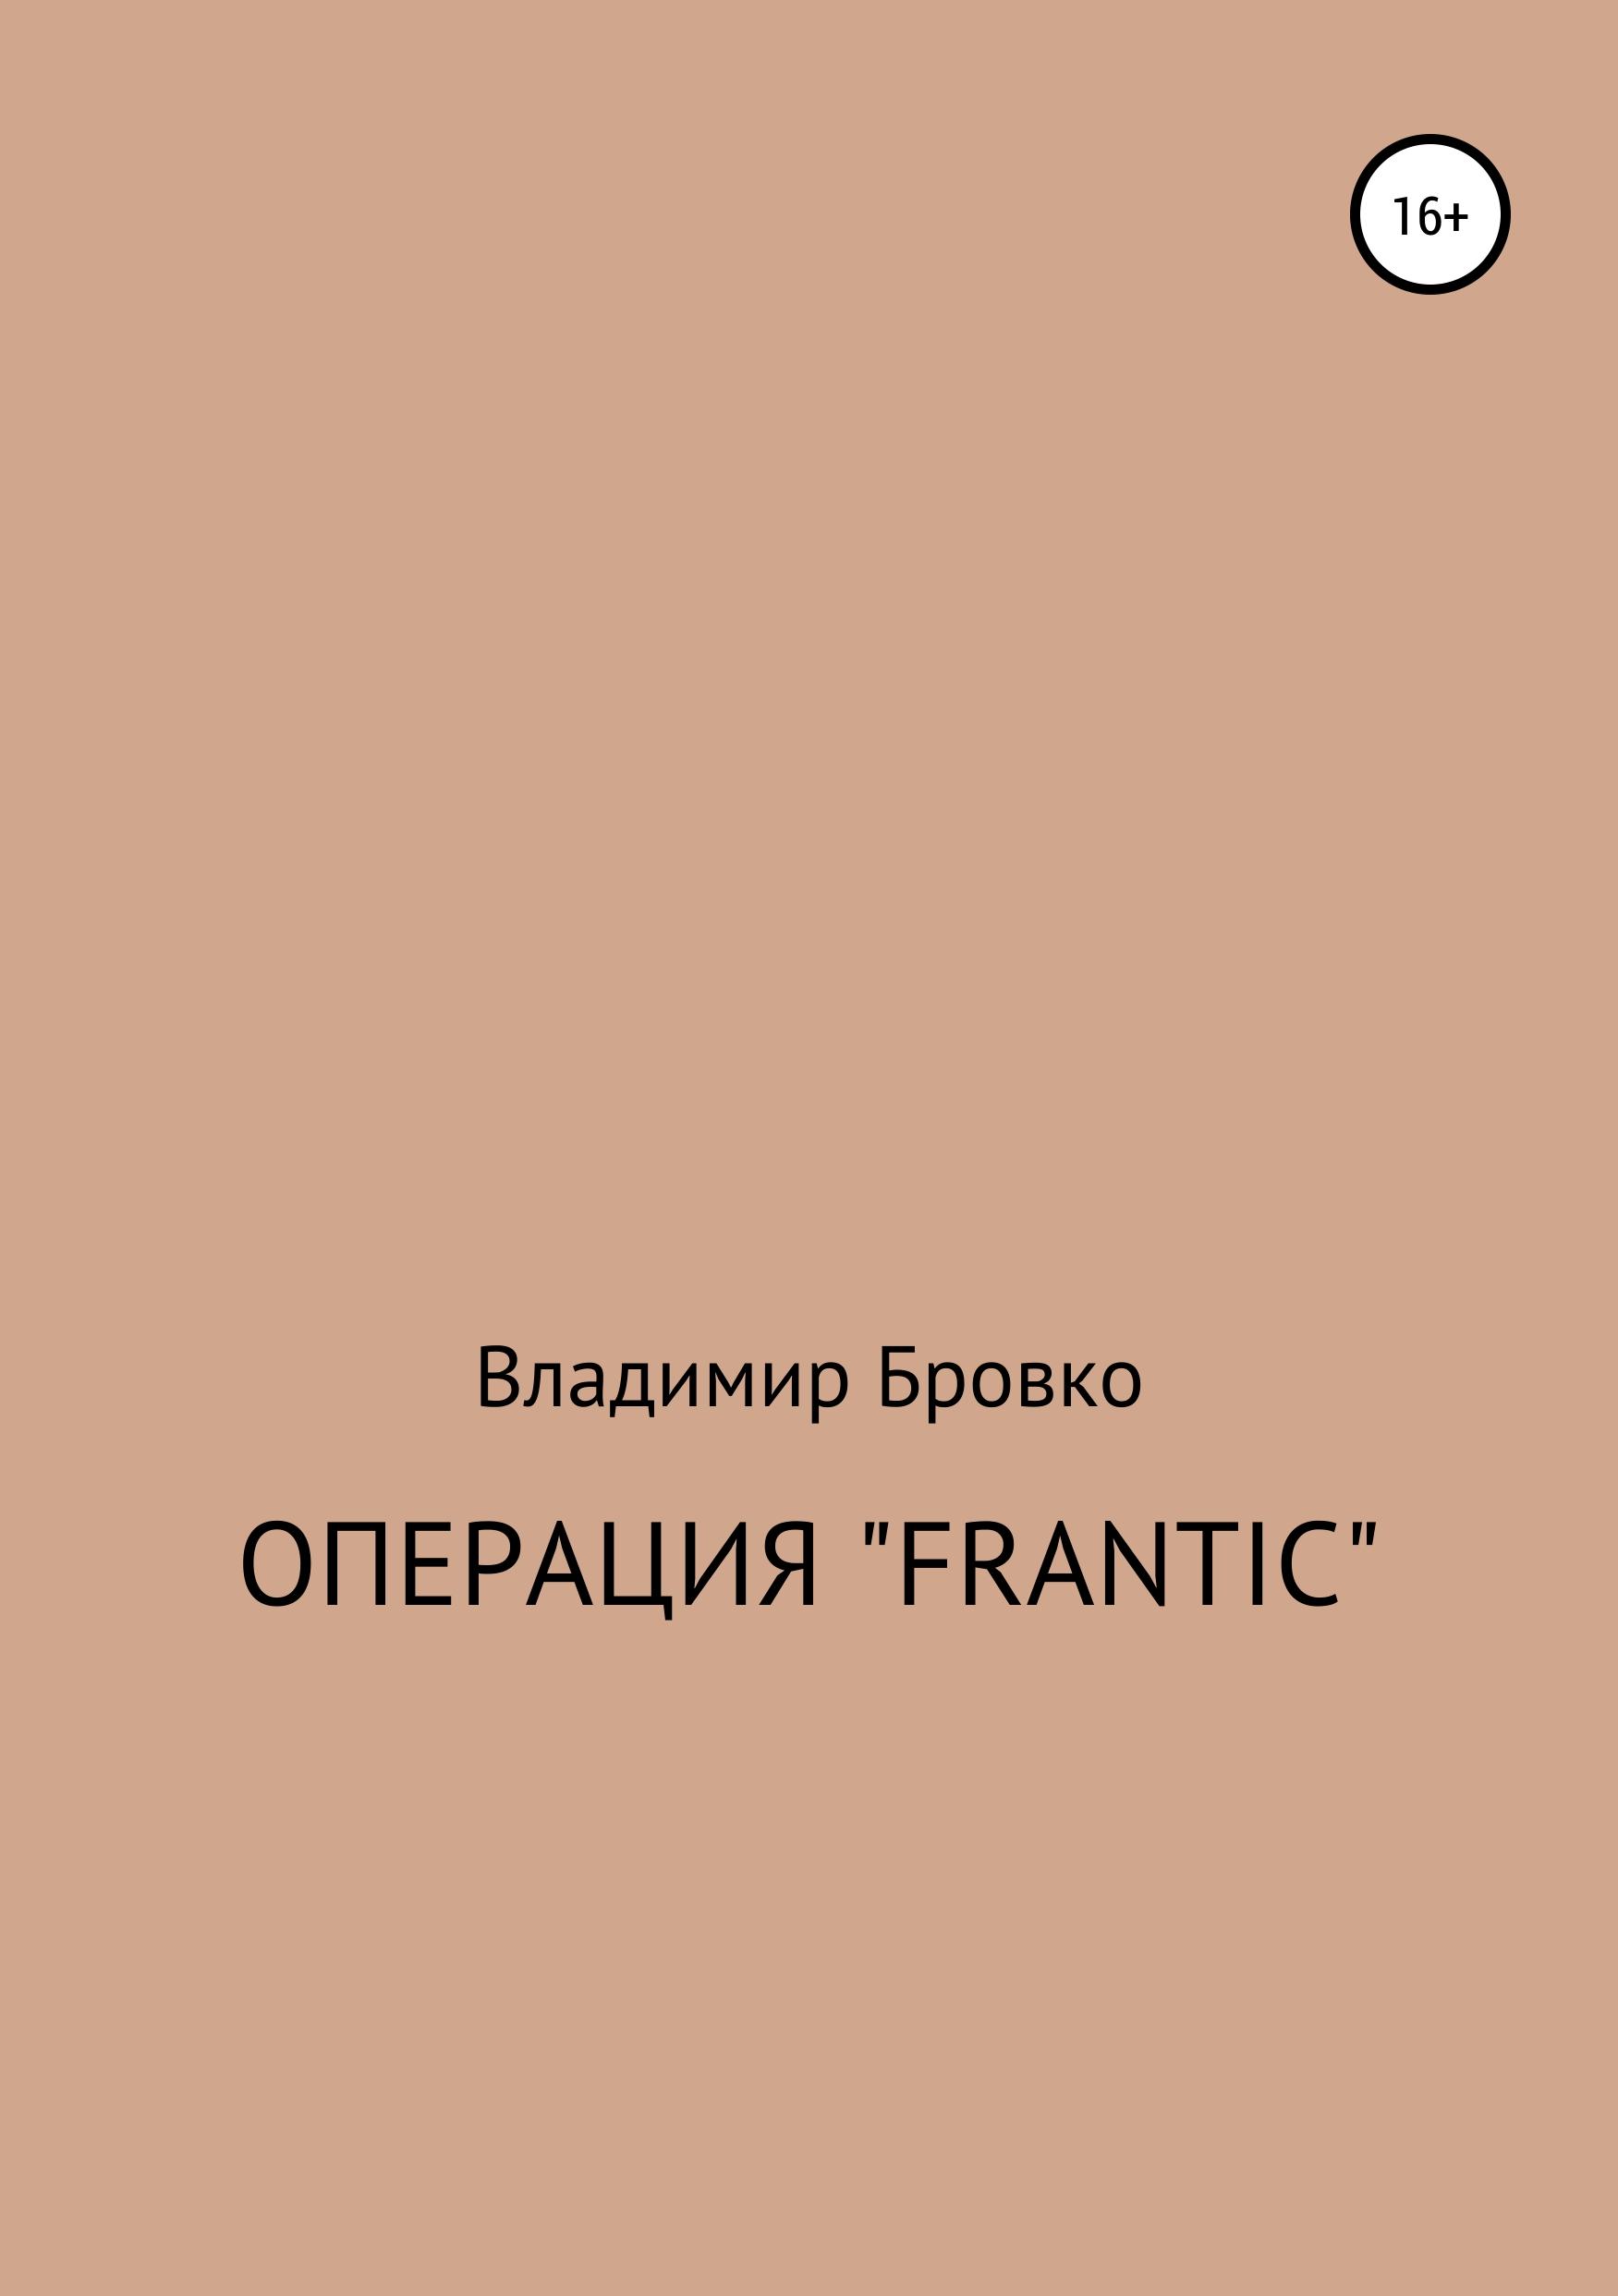 Операция «Frantic»